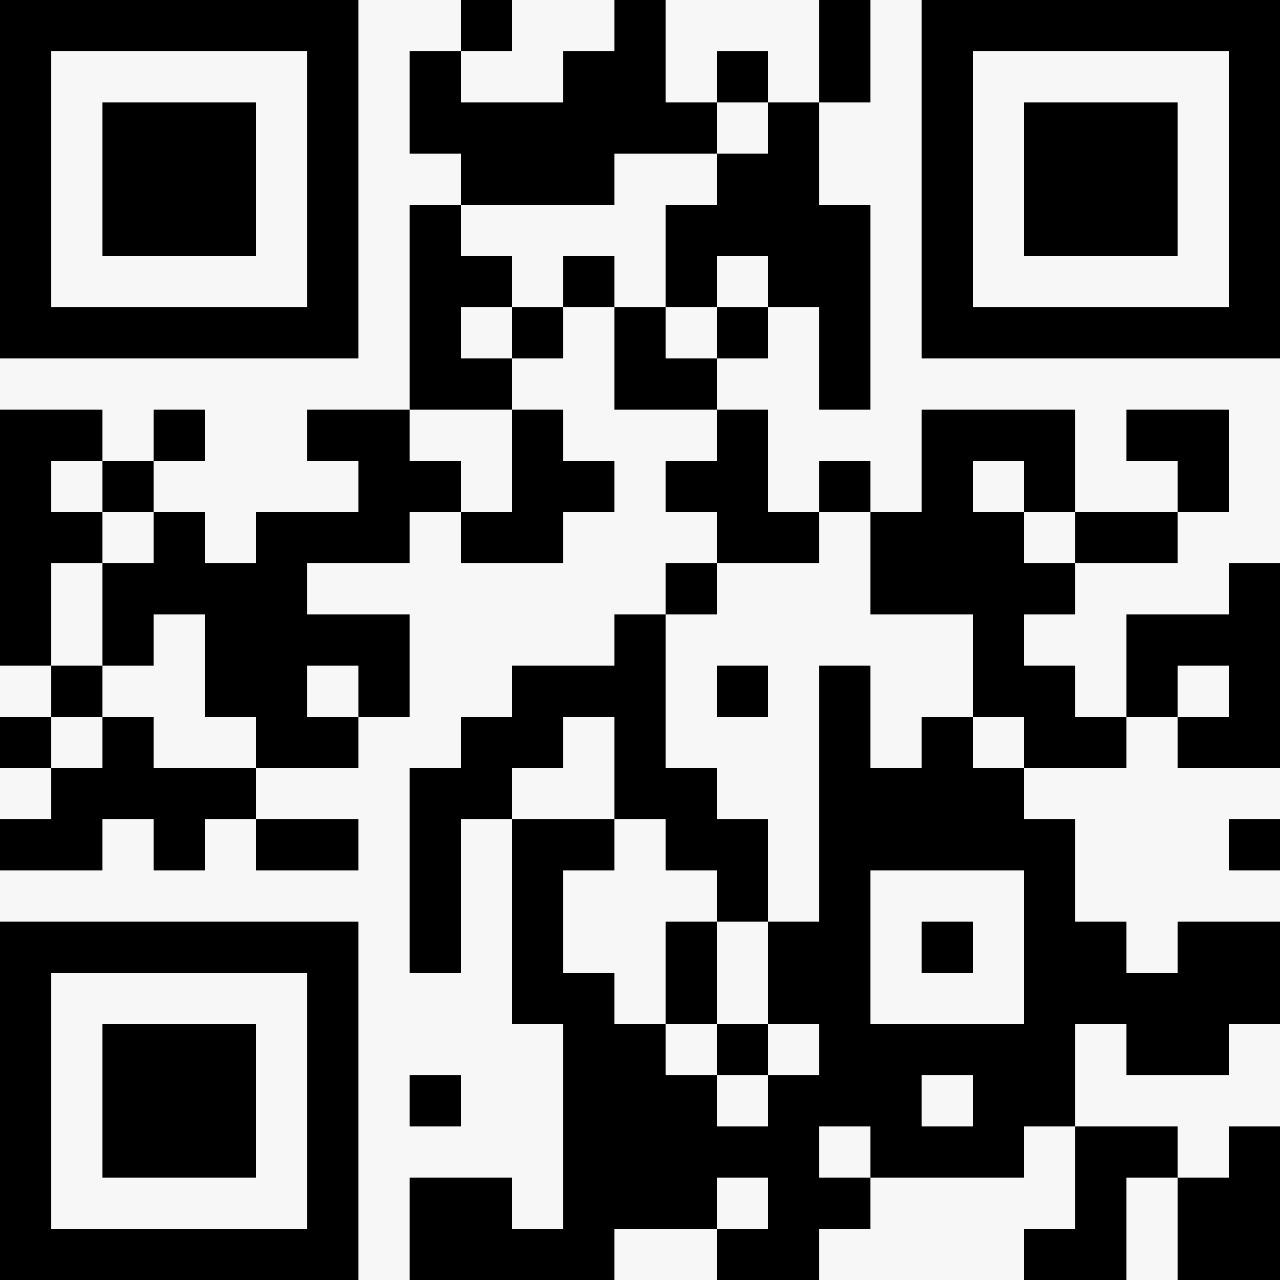 WhatsApp-Image QR-код